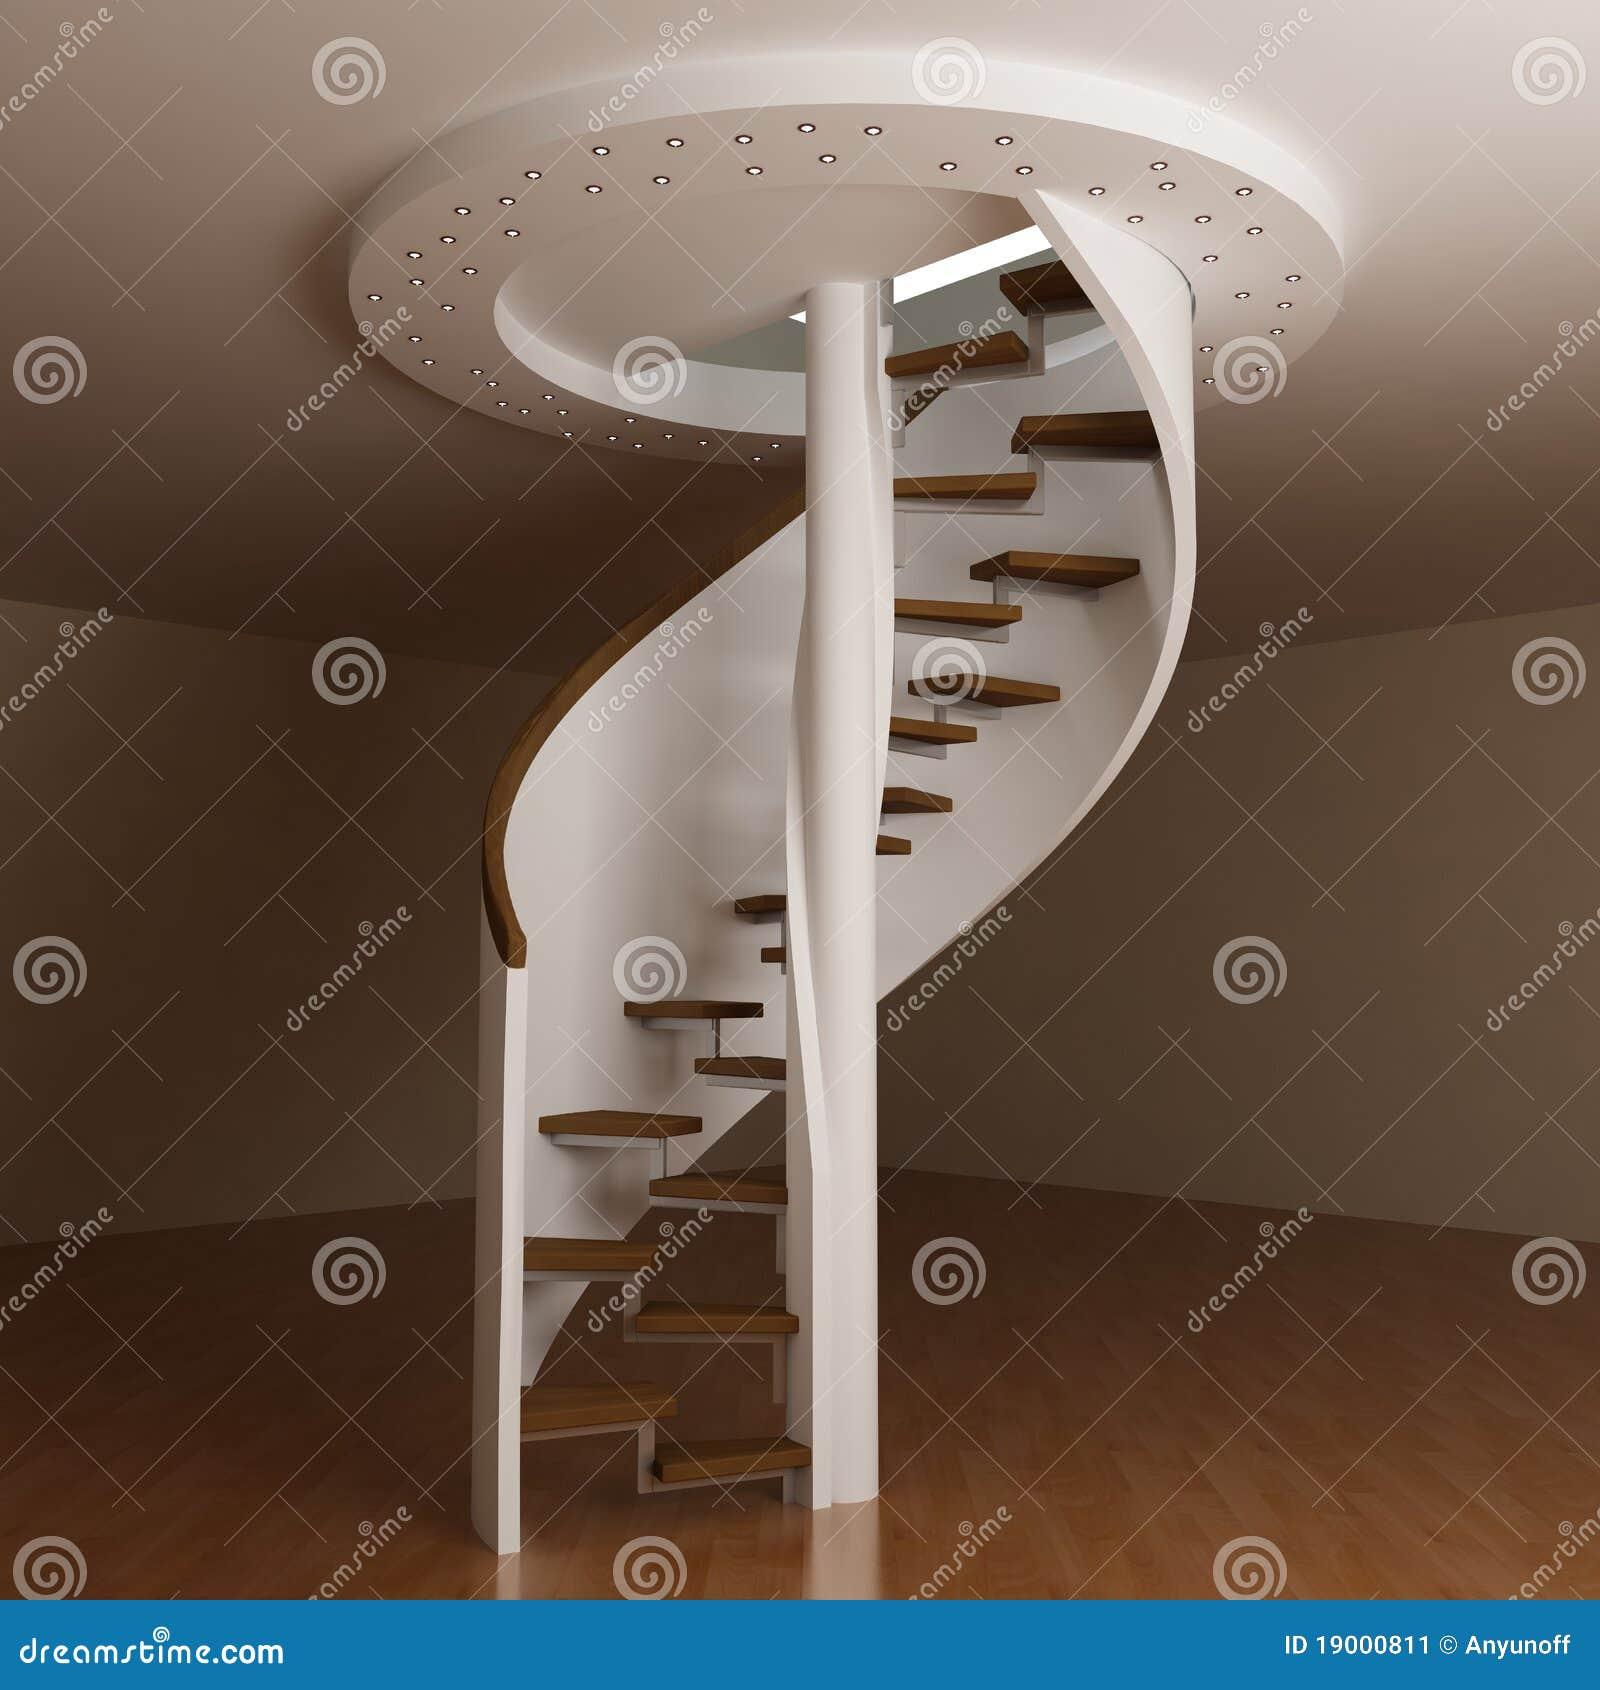 runde treppe stock abbildung illustration von struktur 19000811. Black Bedroom Furniture Sets. Home Design Ideas